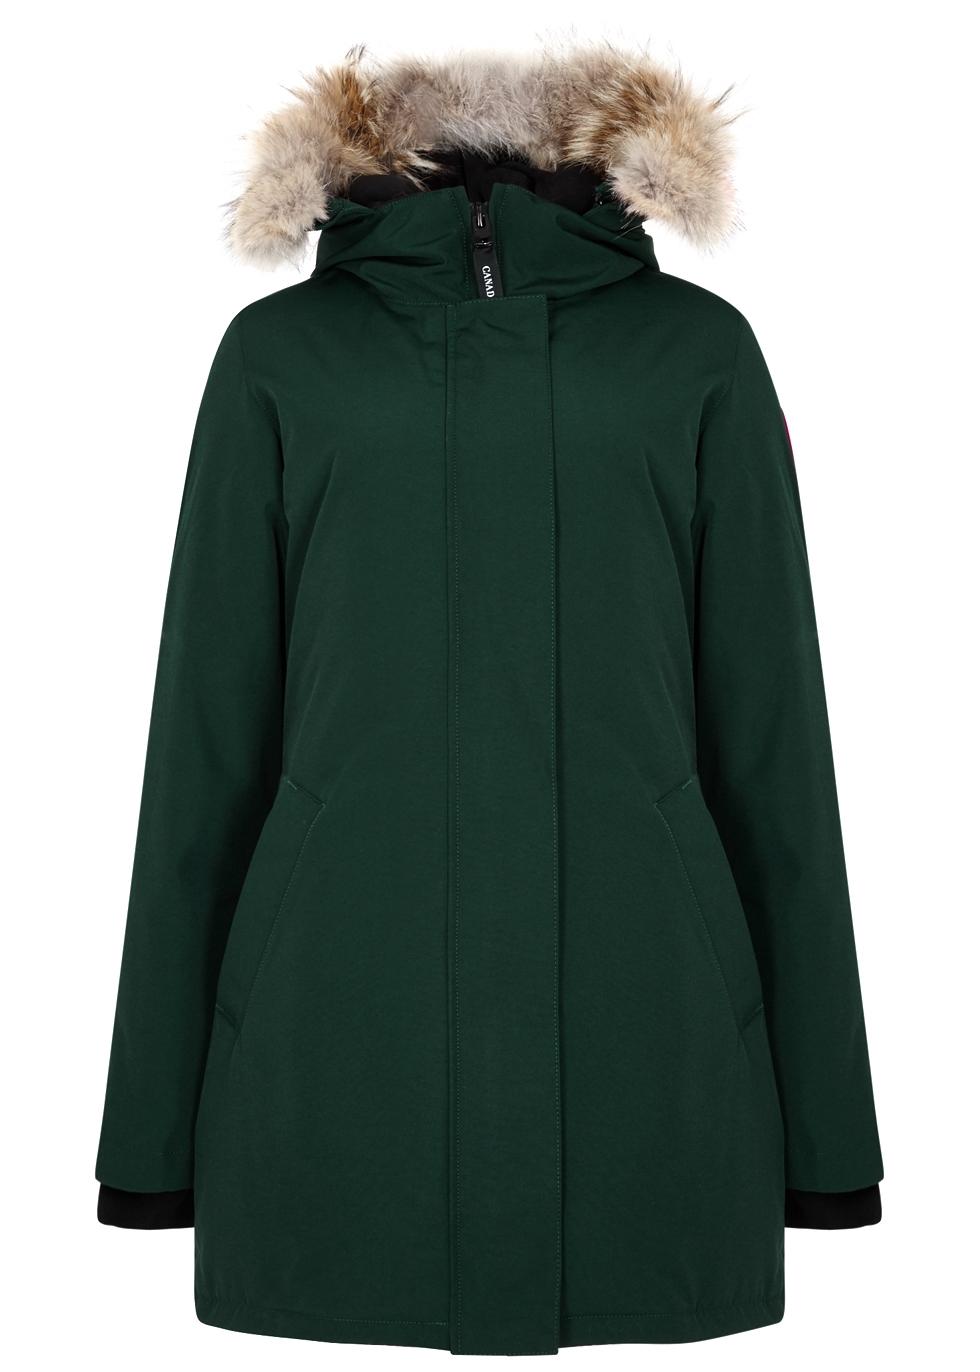 canada goose victoria dark green fur trimmed parka harvey nichols rh harveynichols com